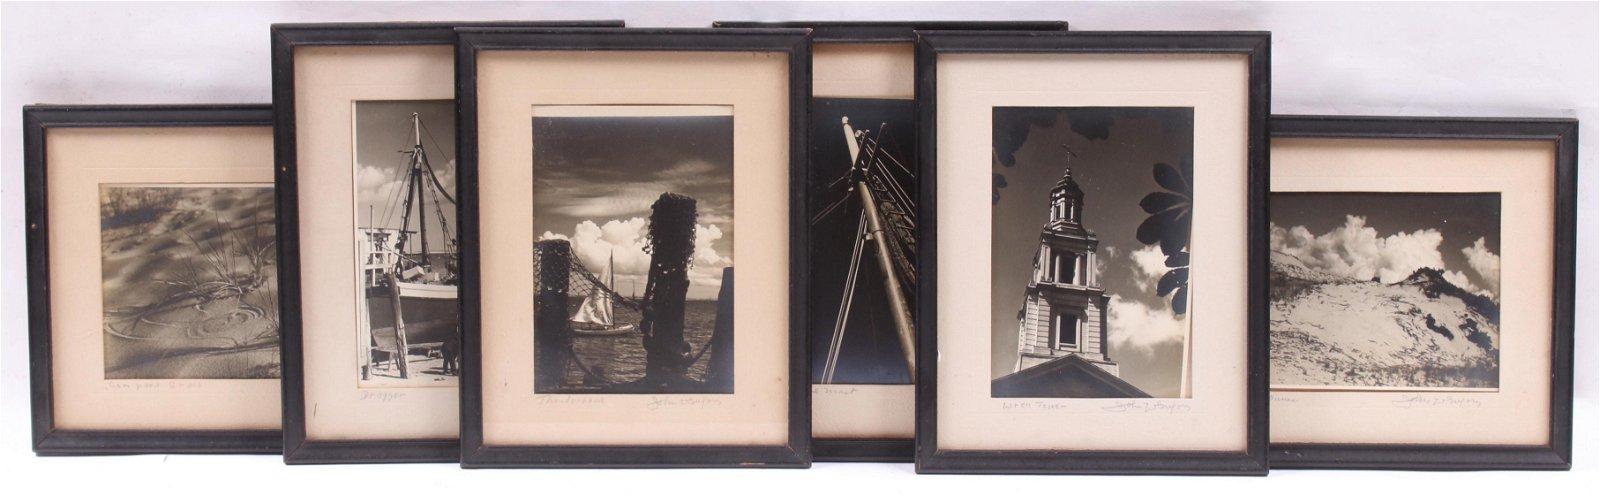 John W. Gregory (1903-1992) Six Photographs